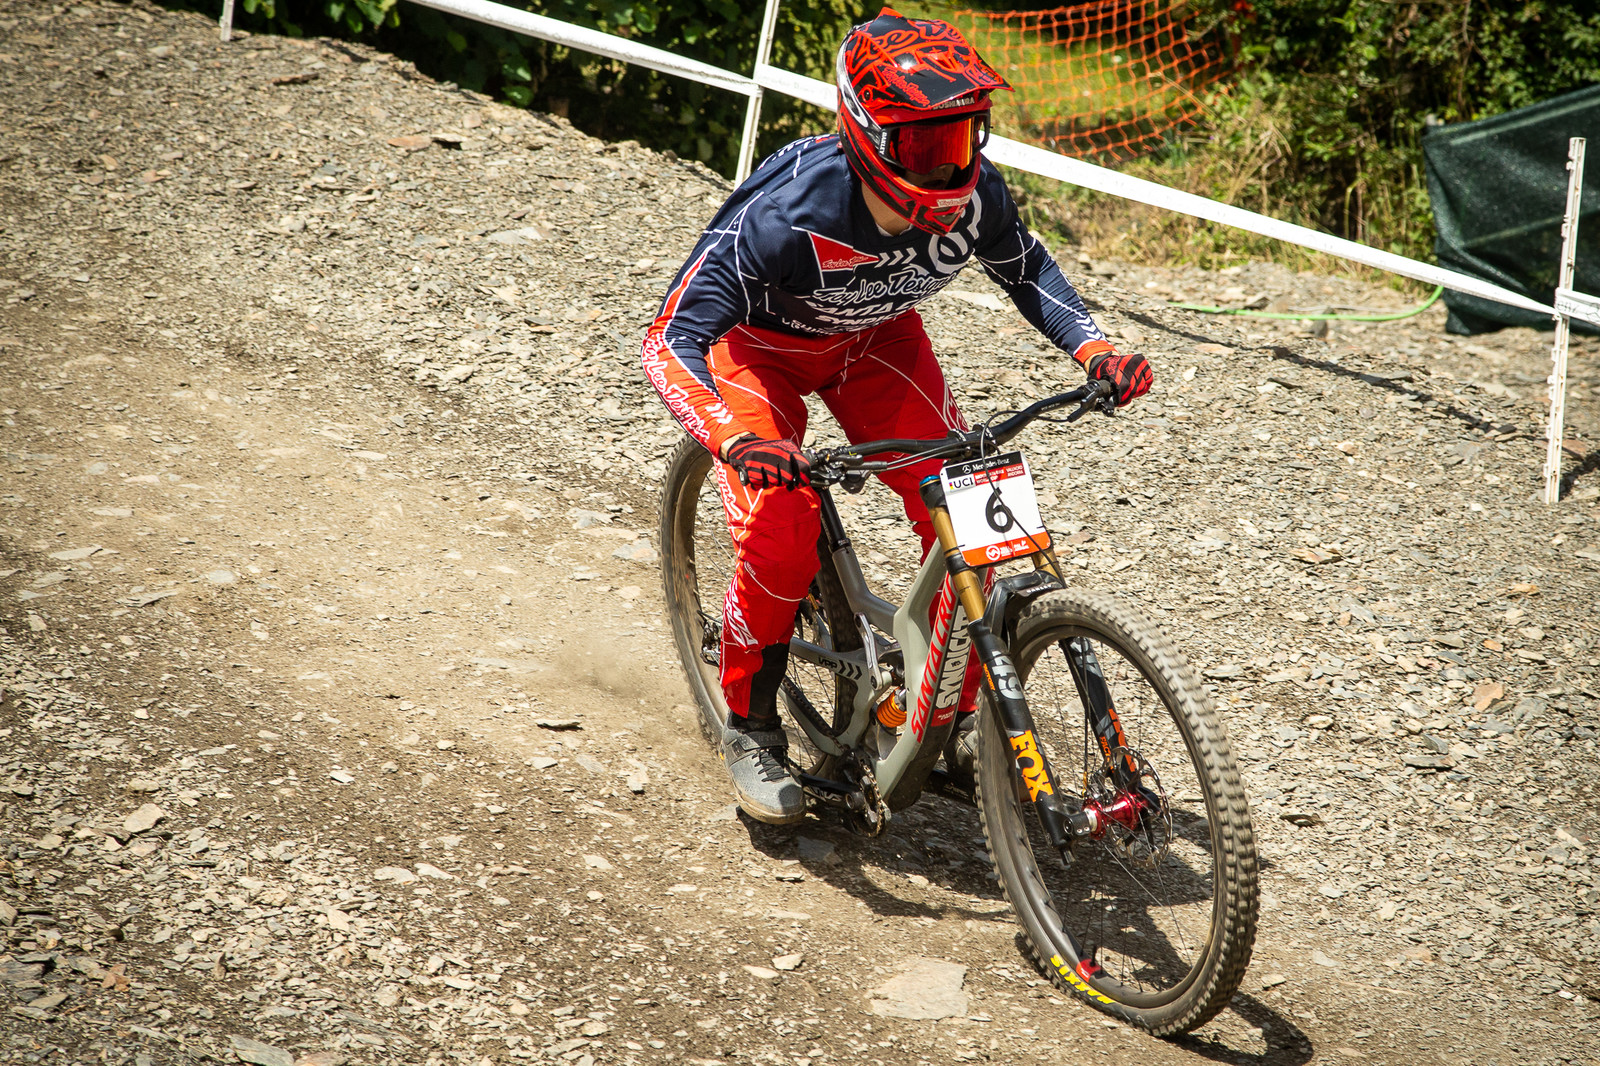 Luca Shaw Santa Cruz V10 - G-Out Project - Andorra World Cup DH - Mountain Biking Pictures - Vital MTB